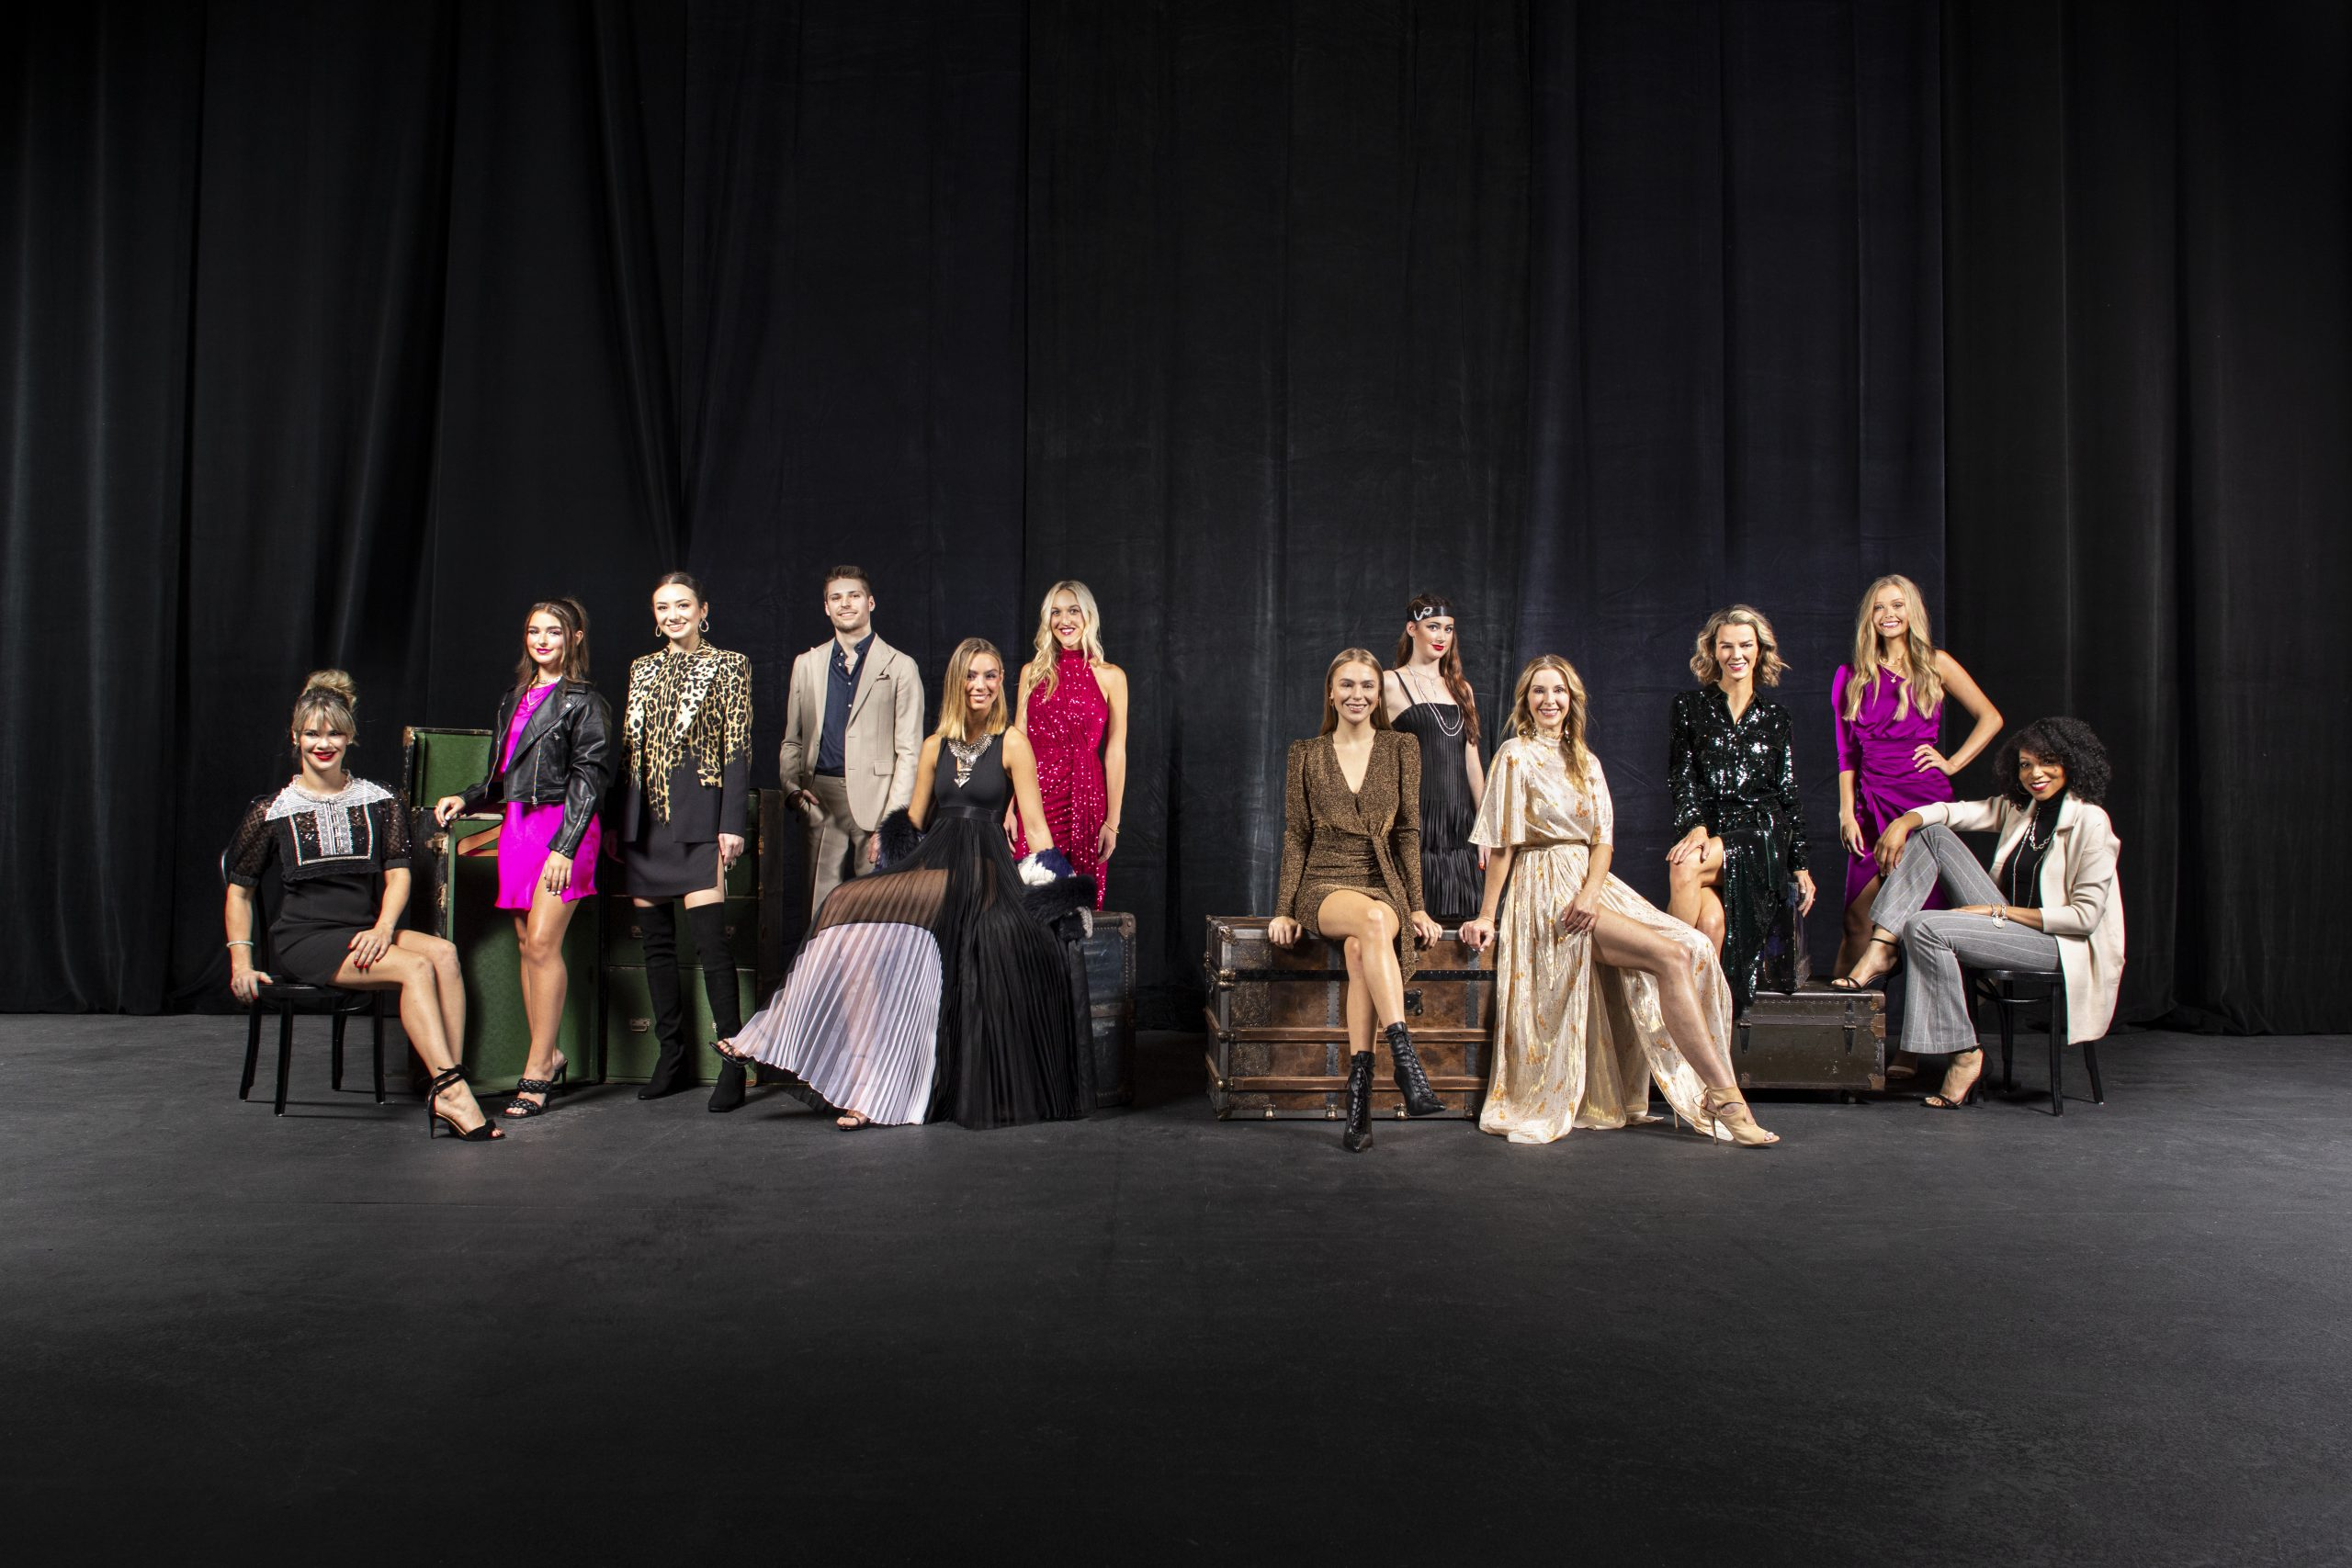 Festival of Fashion | Boutique Feature